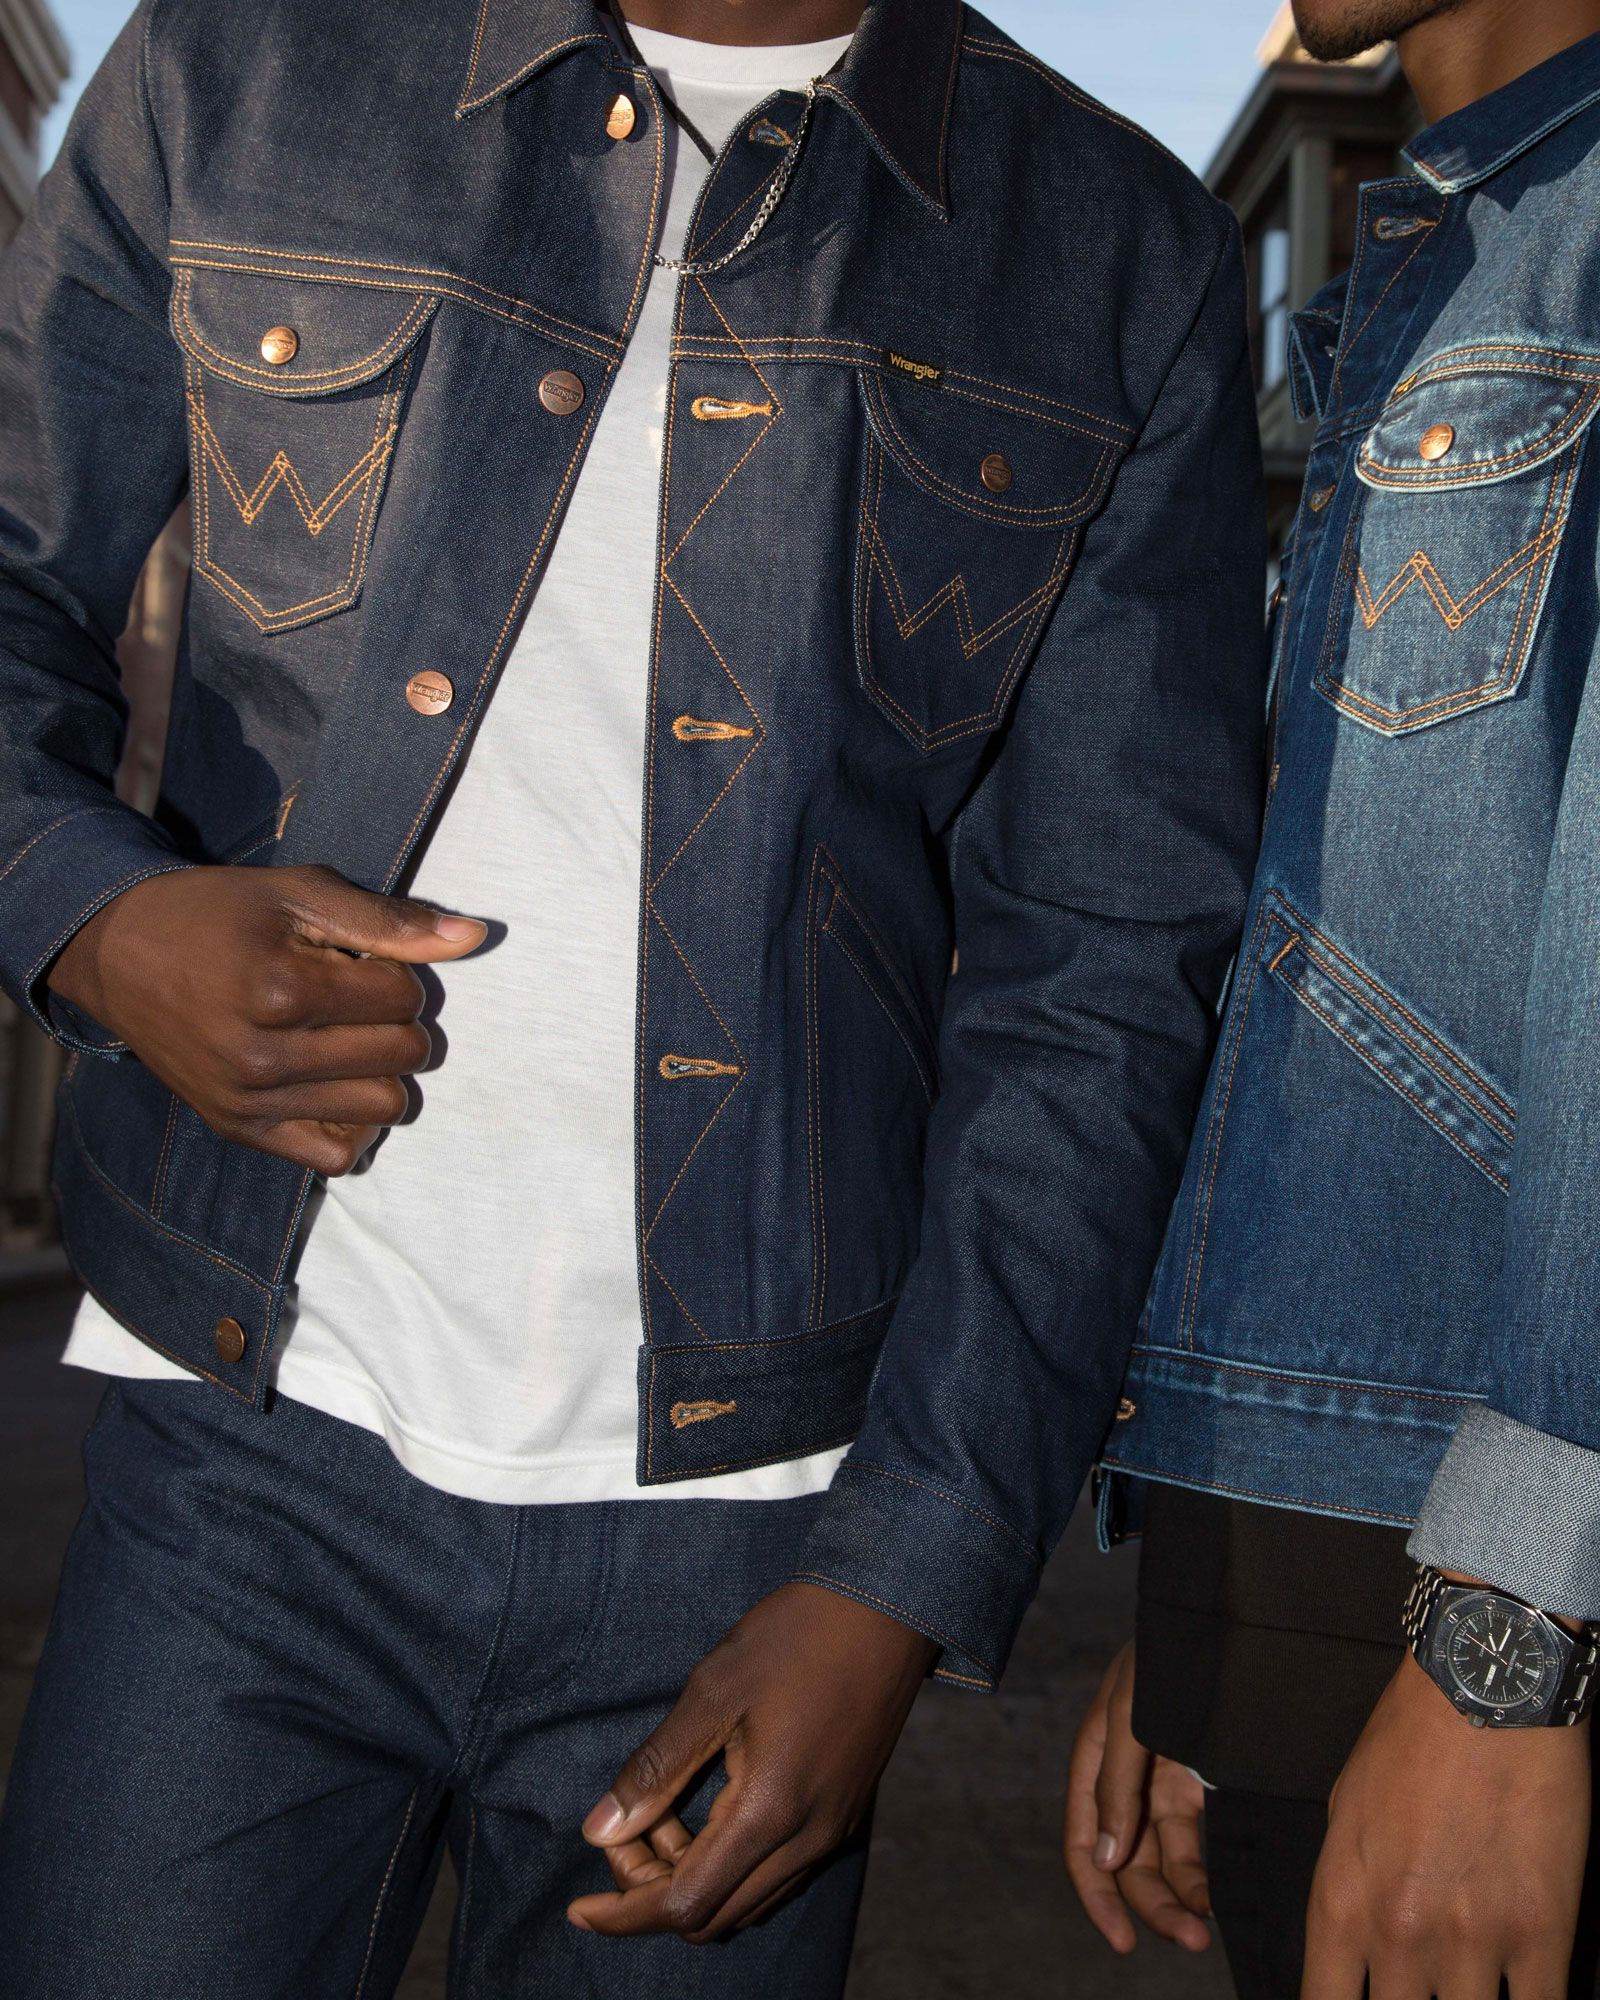 Wrangler Icons 124mj Men S Denim Jacket Men S Jackets Outerwear Wrangler Denim Jacket Men Denim Jacket Pants Outfit Men [ 2000 x 1600 Pixel ]